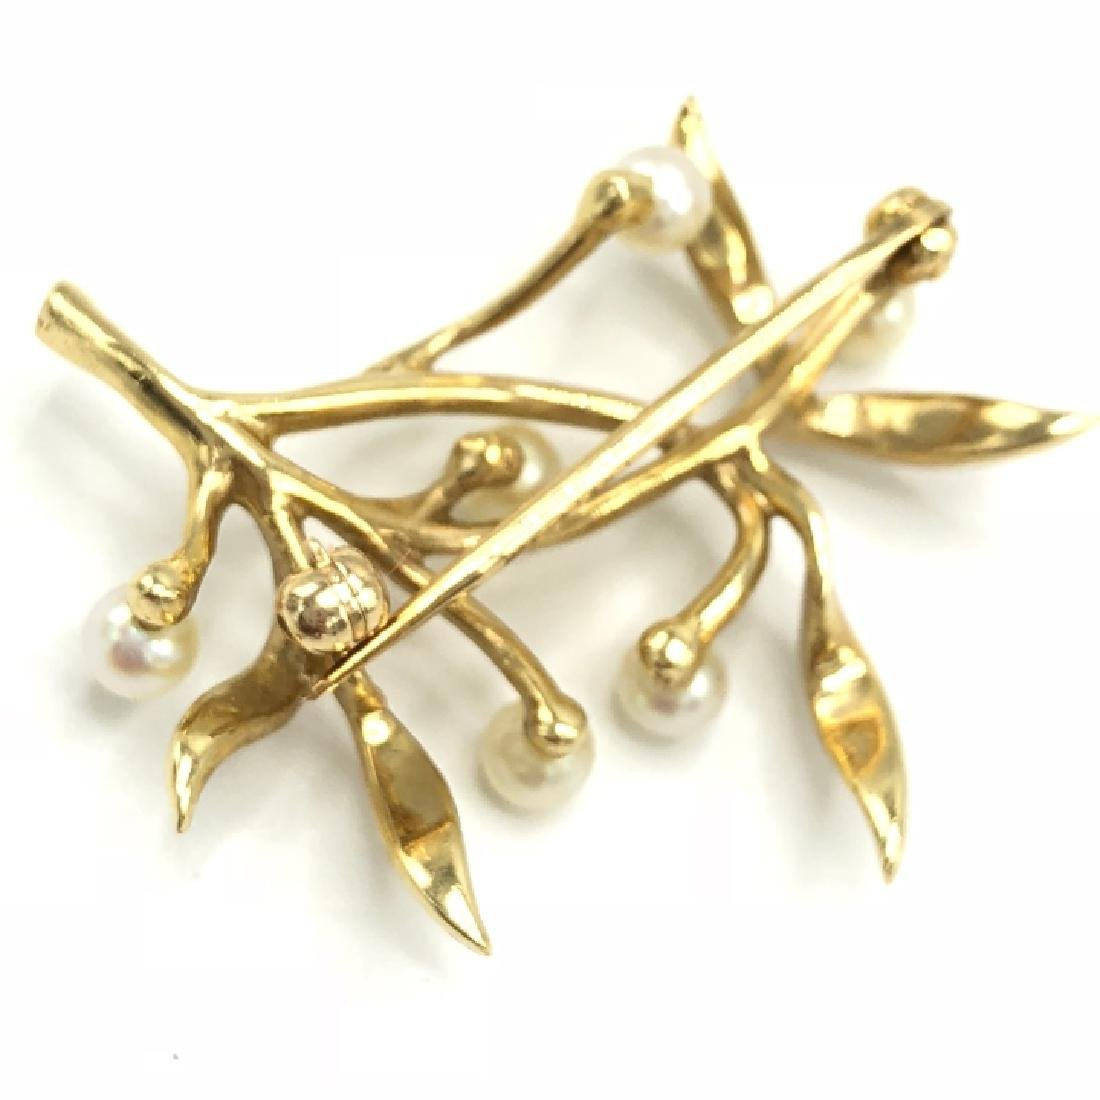 Estate / Vintage 14k Gold & Pearl Pin - 2